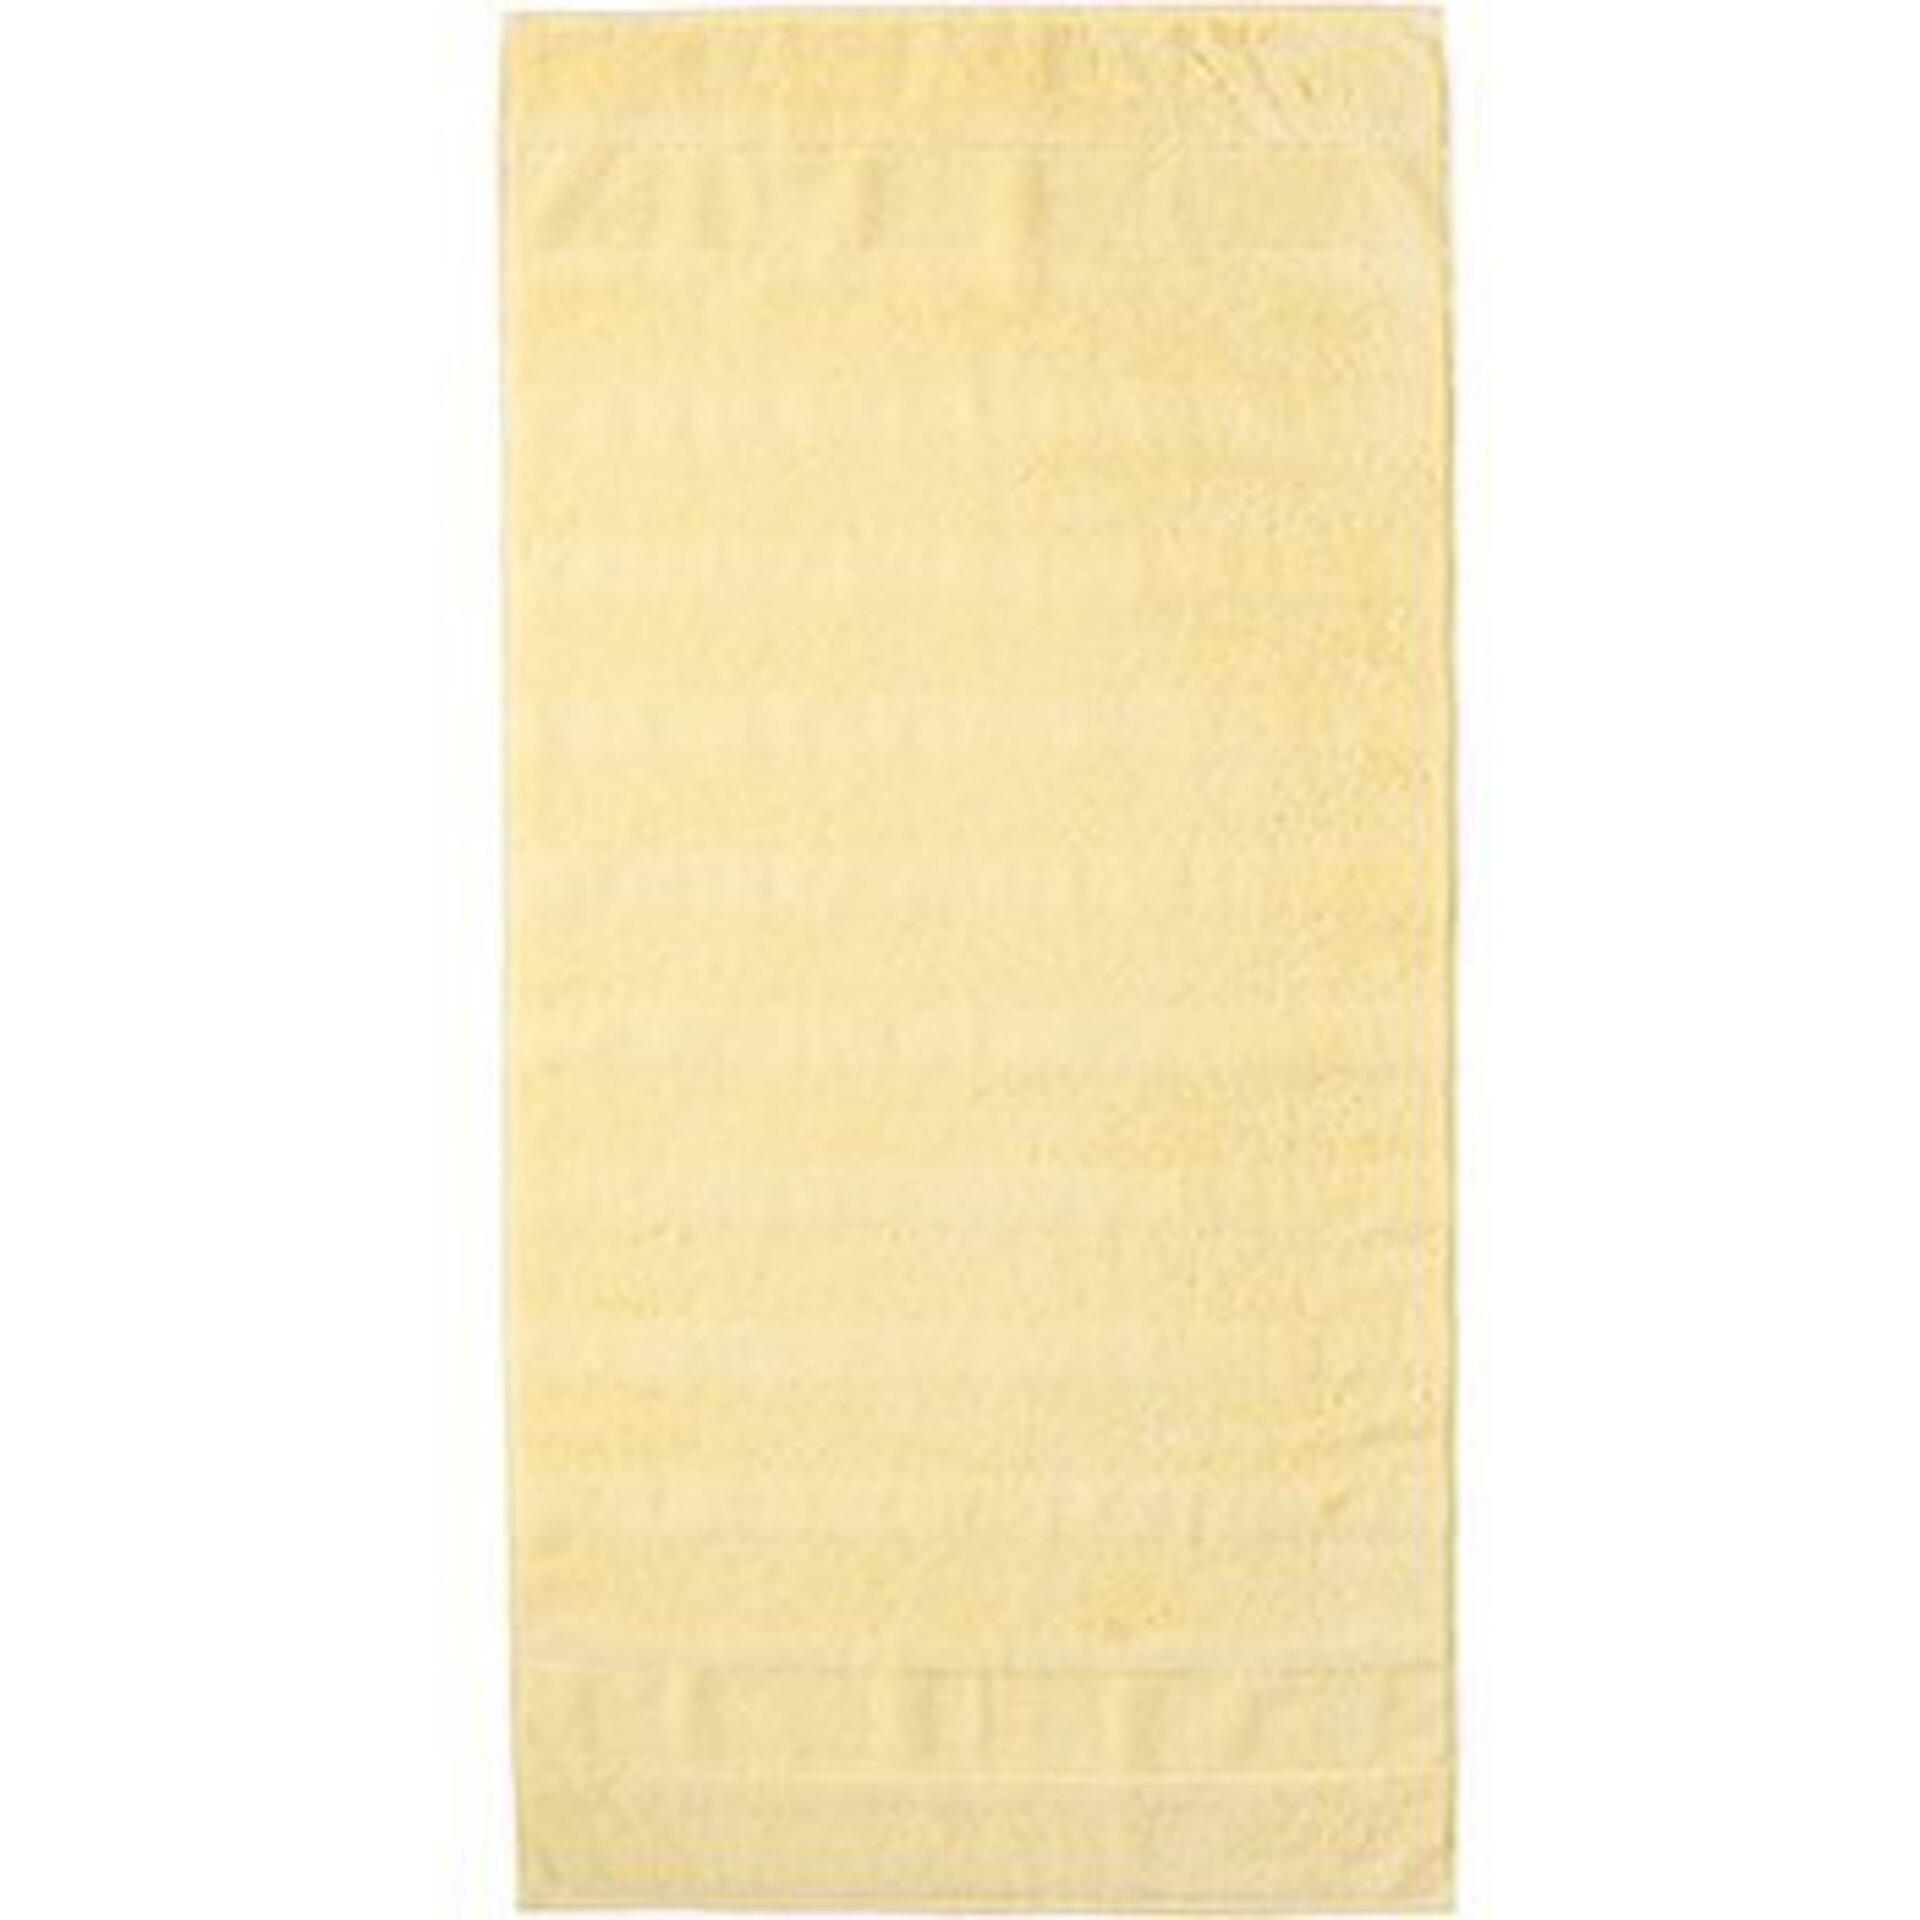 Handtuch Noblesse² Cawö Textil 50 x 100 cm